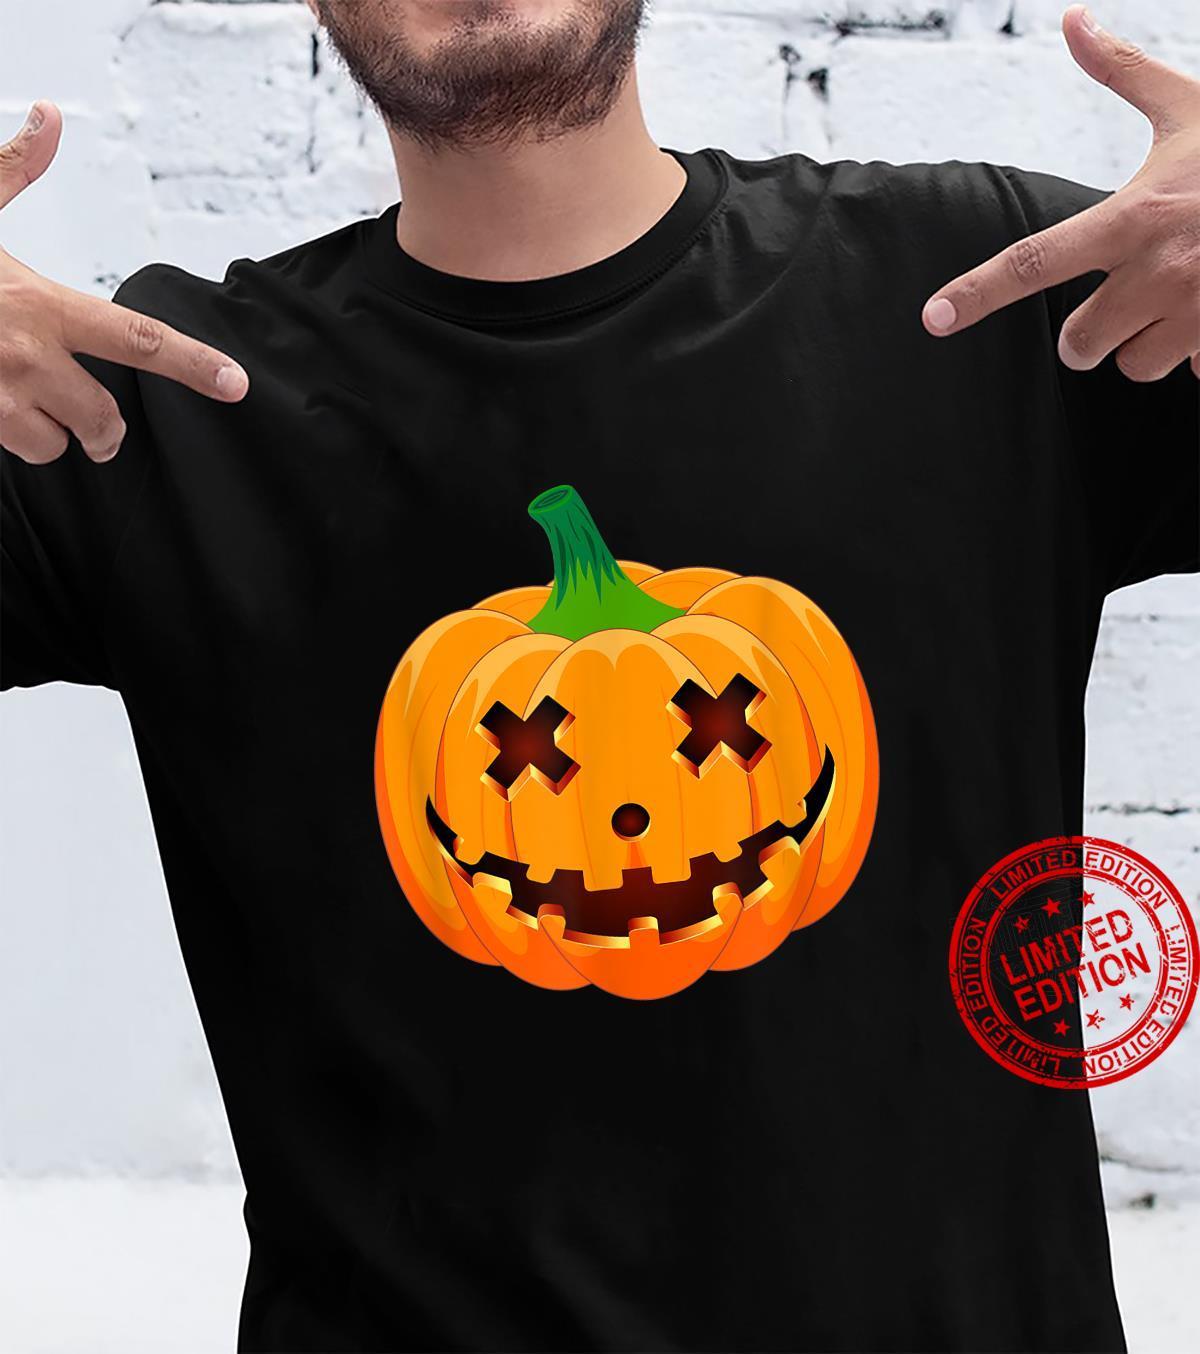 Halloween Frightful Jack Lantern Pumpkin Shirt Jackolantern Shirt